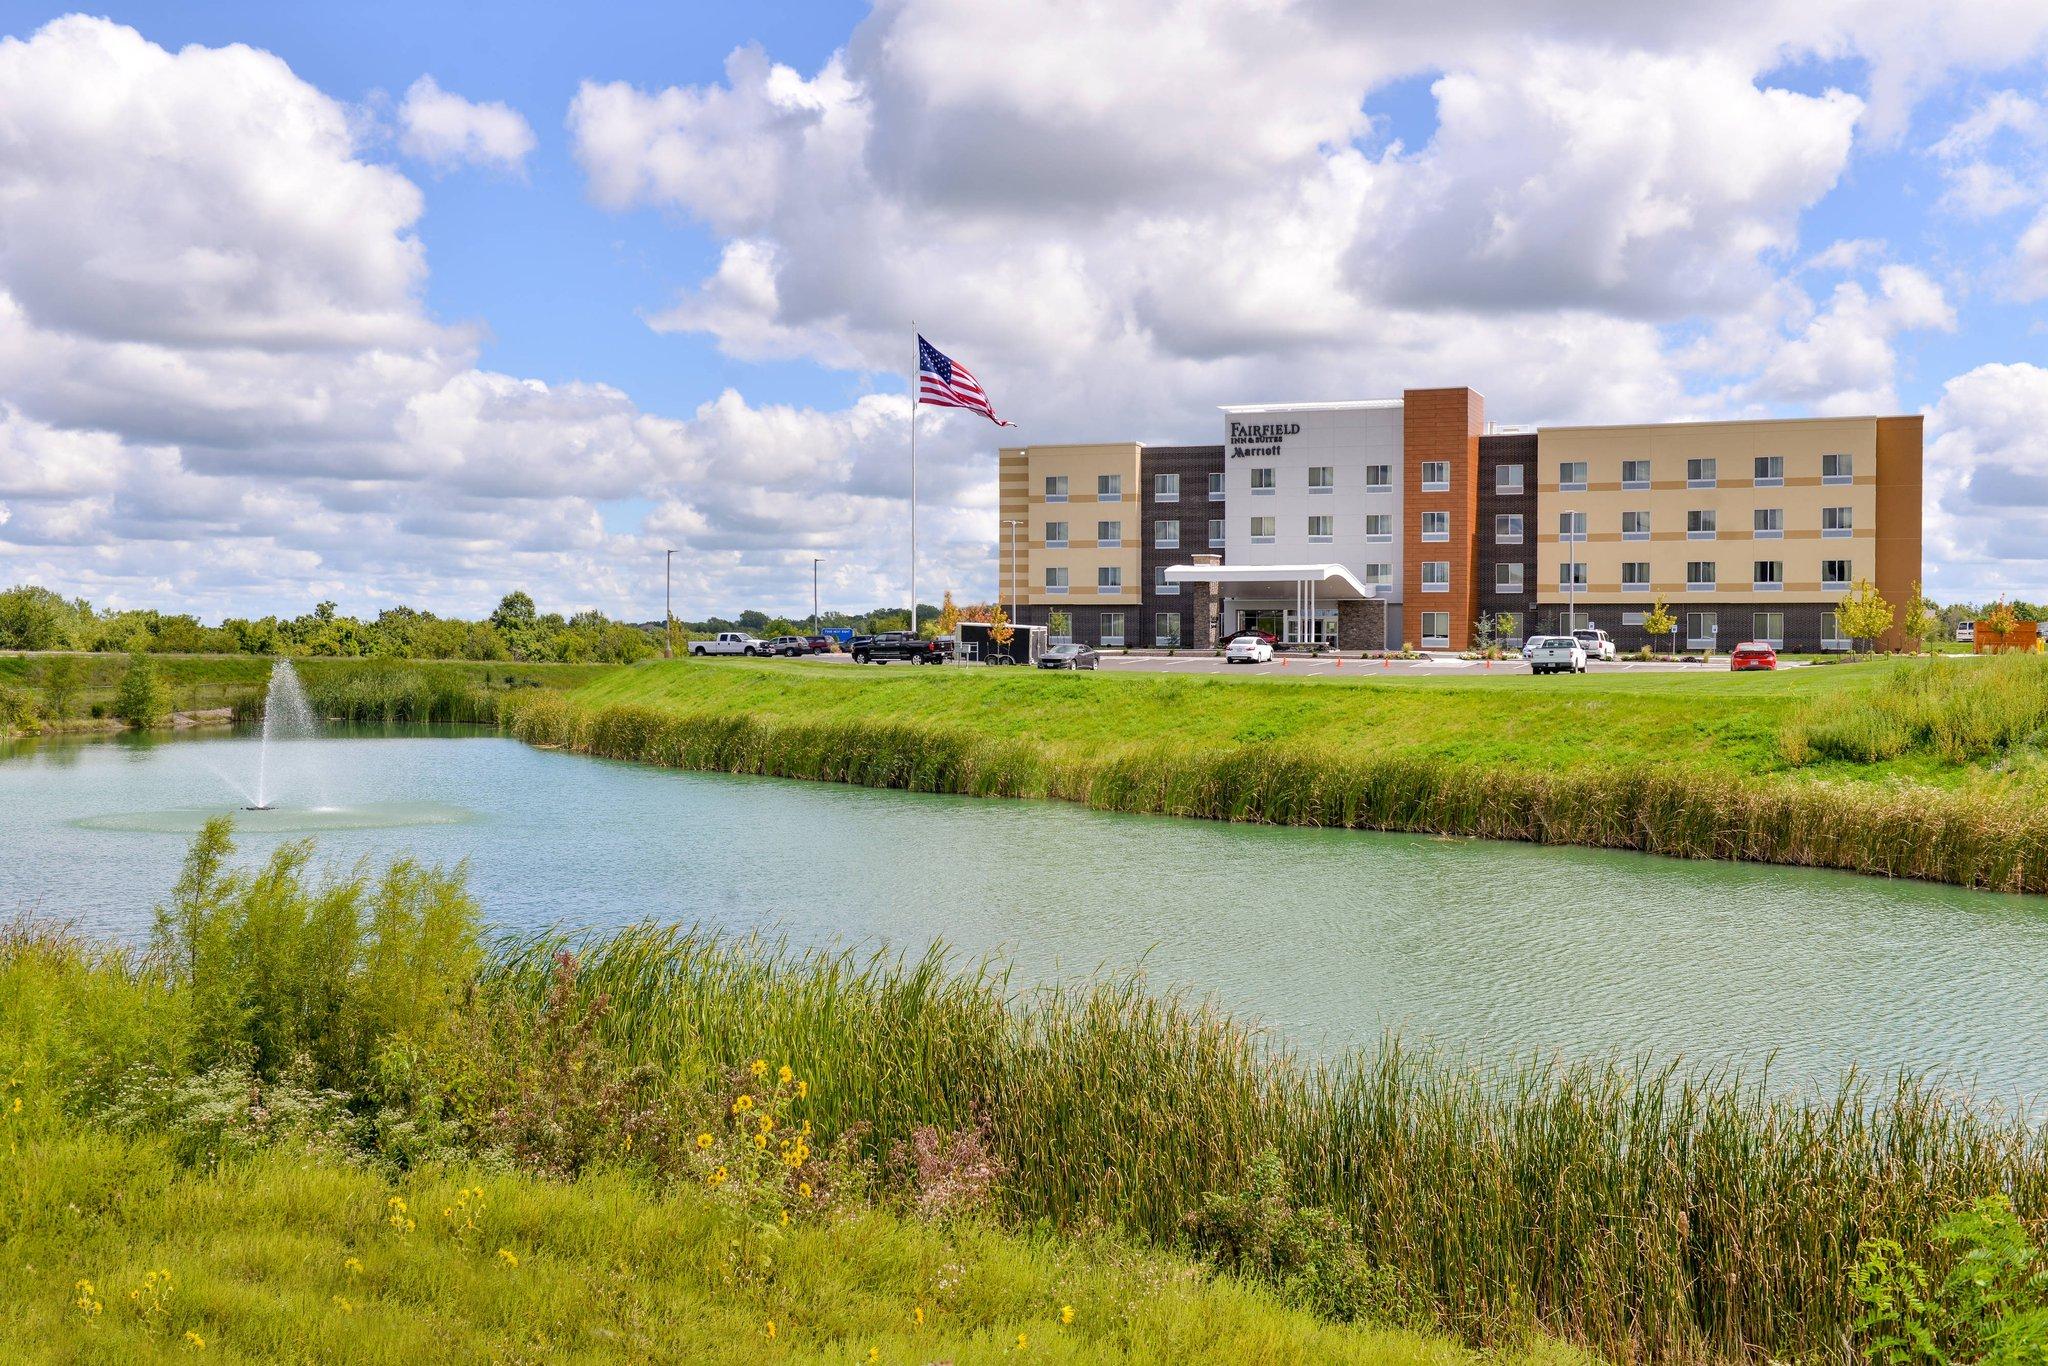 Fairfield Inn and Suites by Marriott Warrensburg